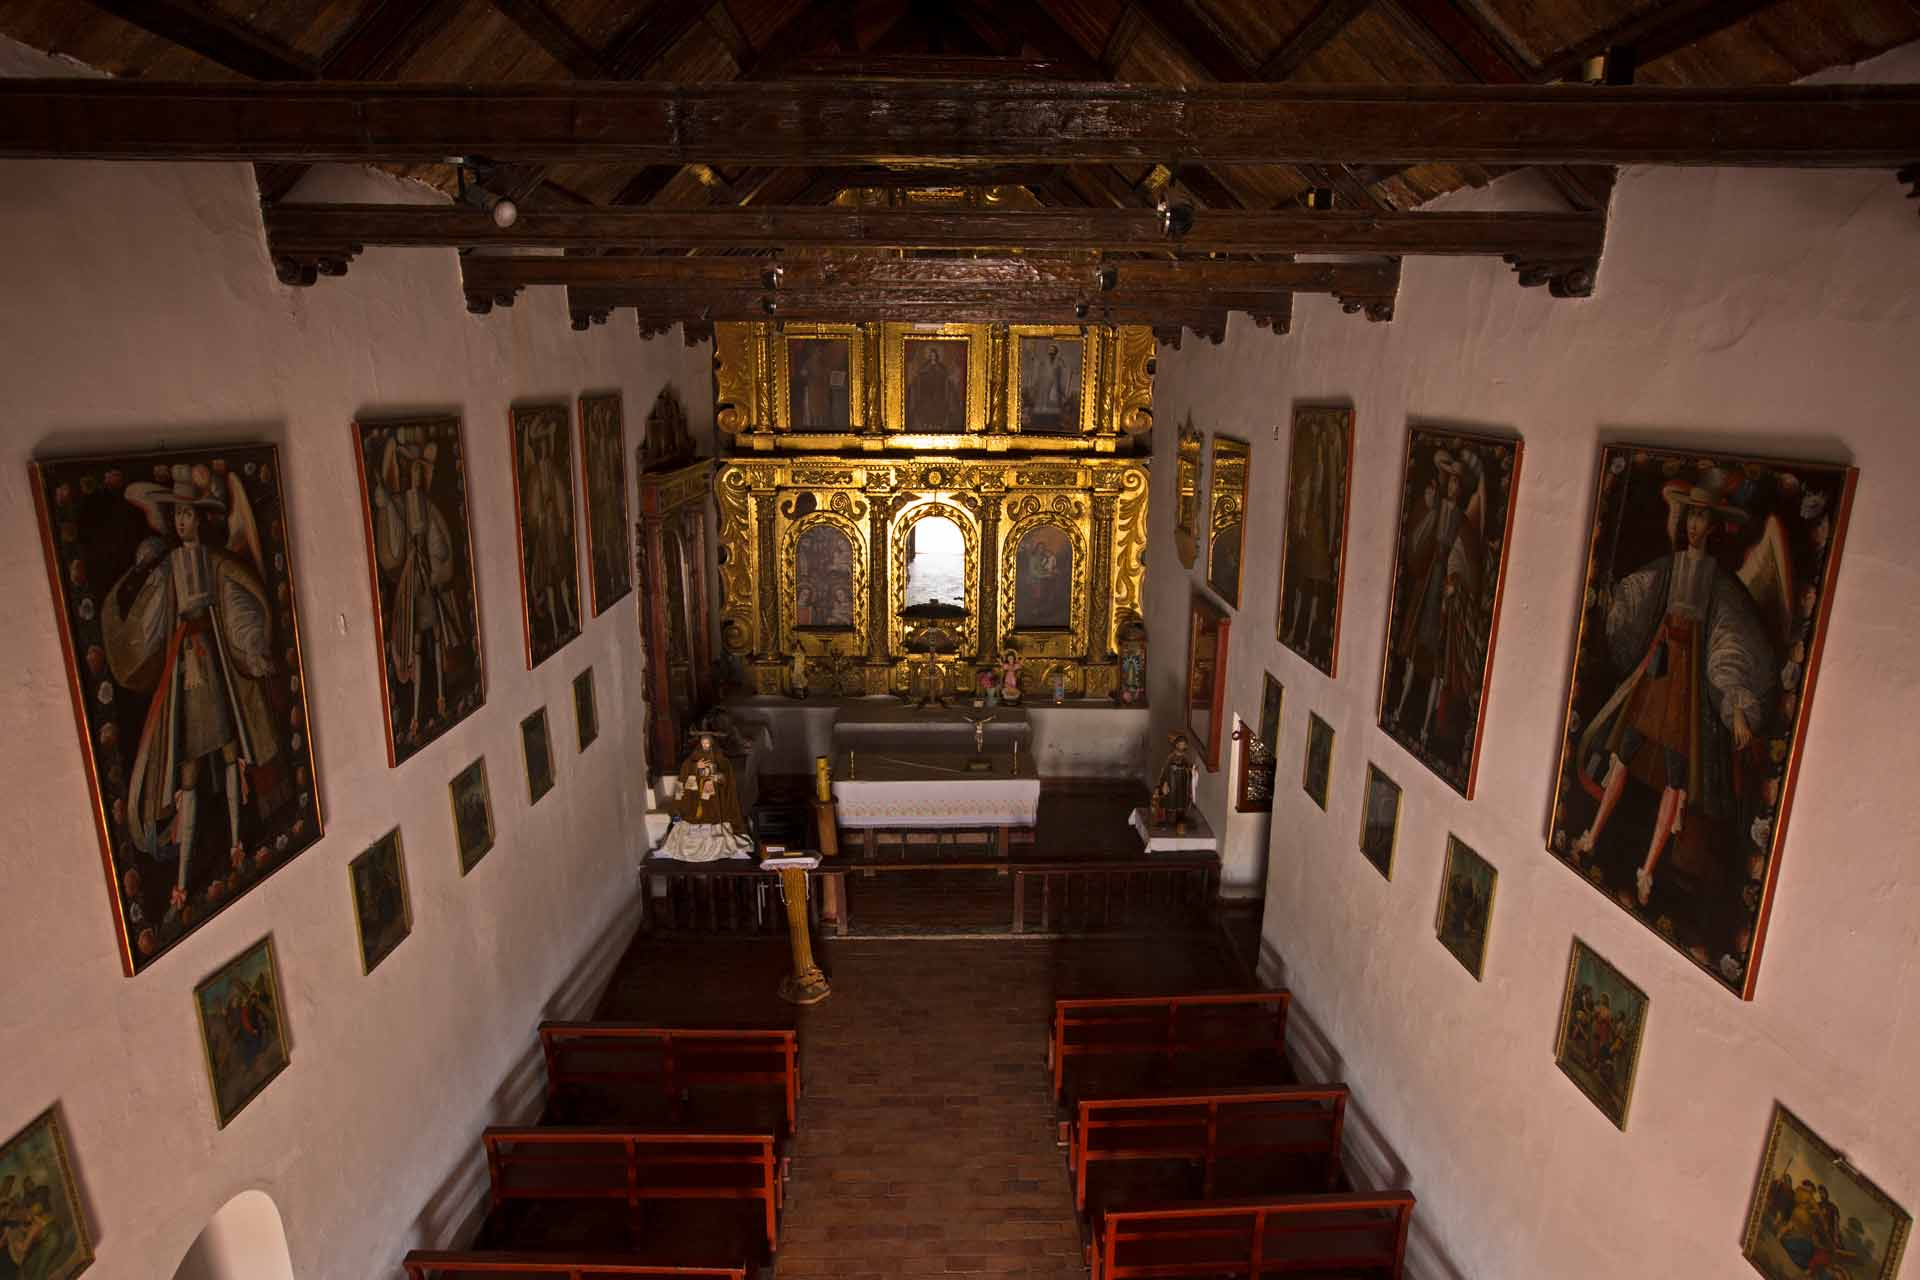 La Iglesia San Francisco de Paula, Uquia/Argentina (17th century)